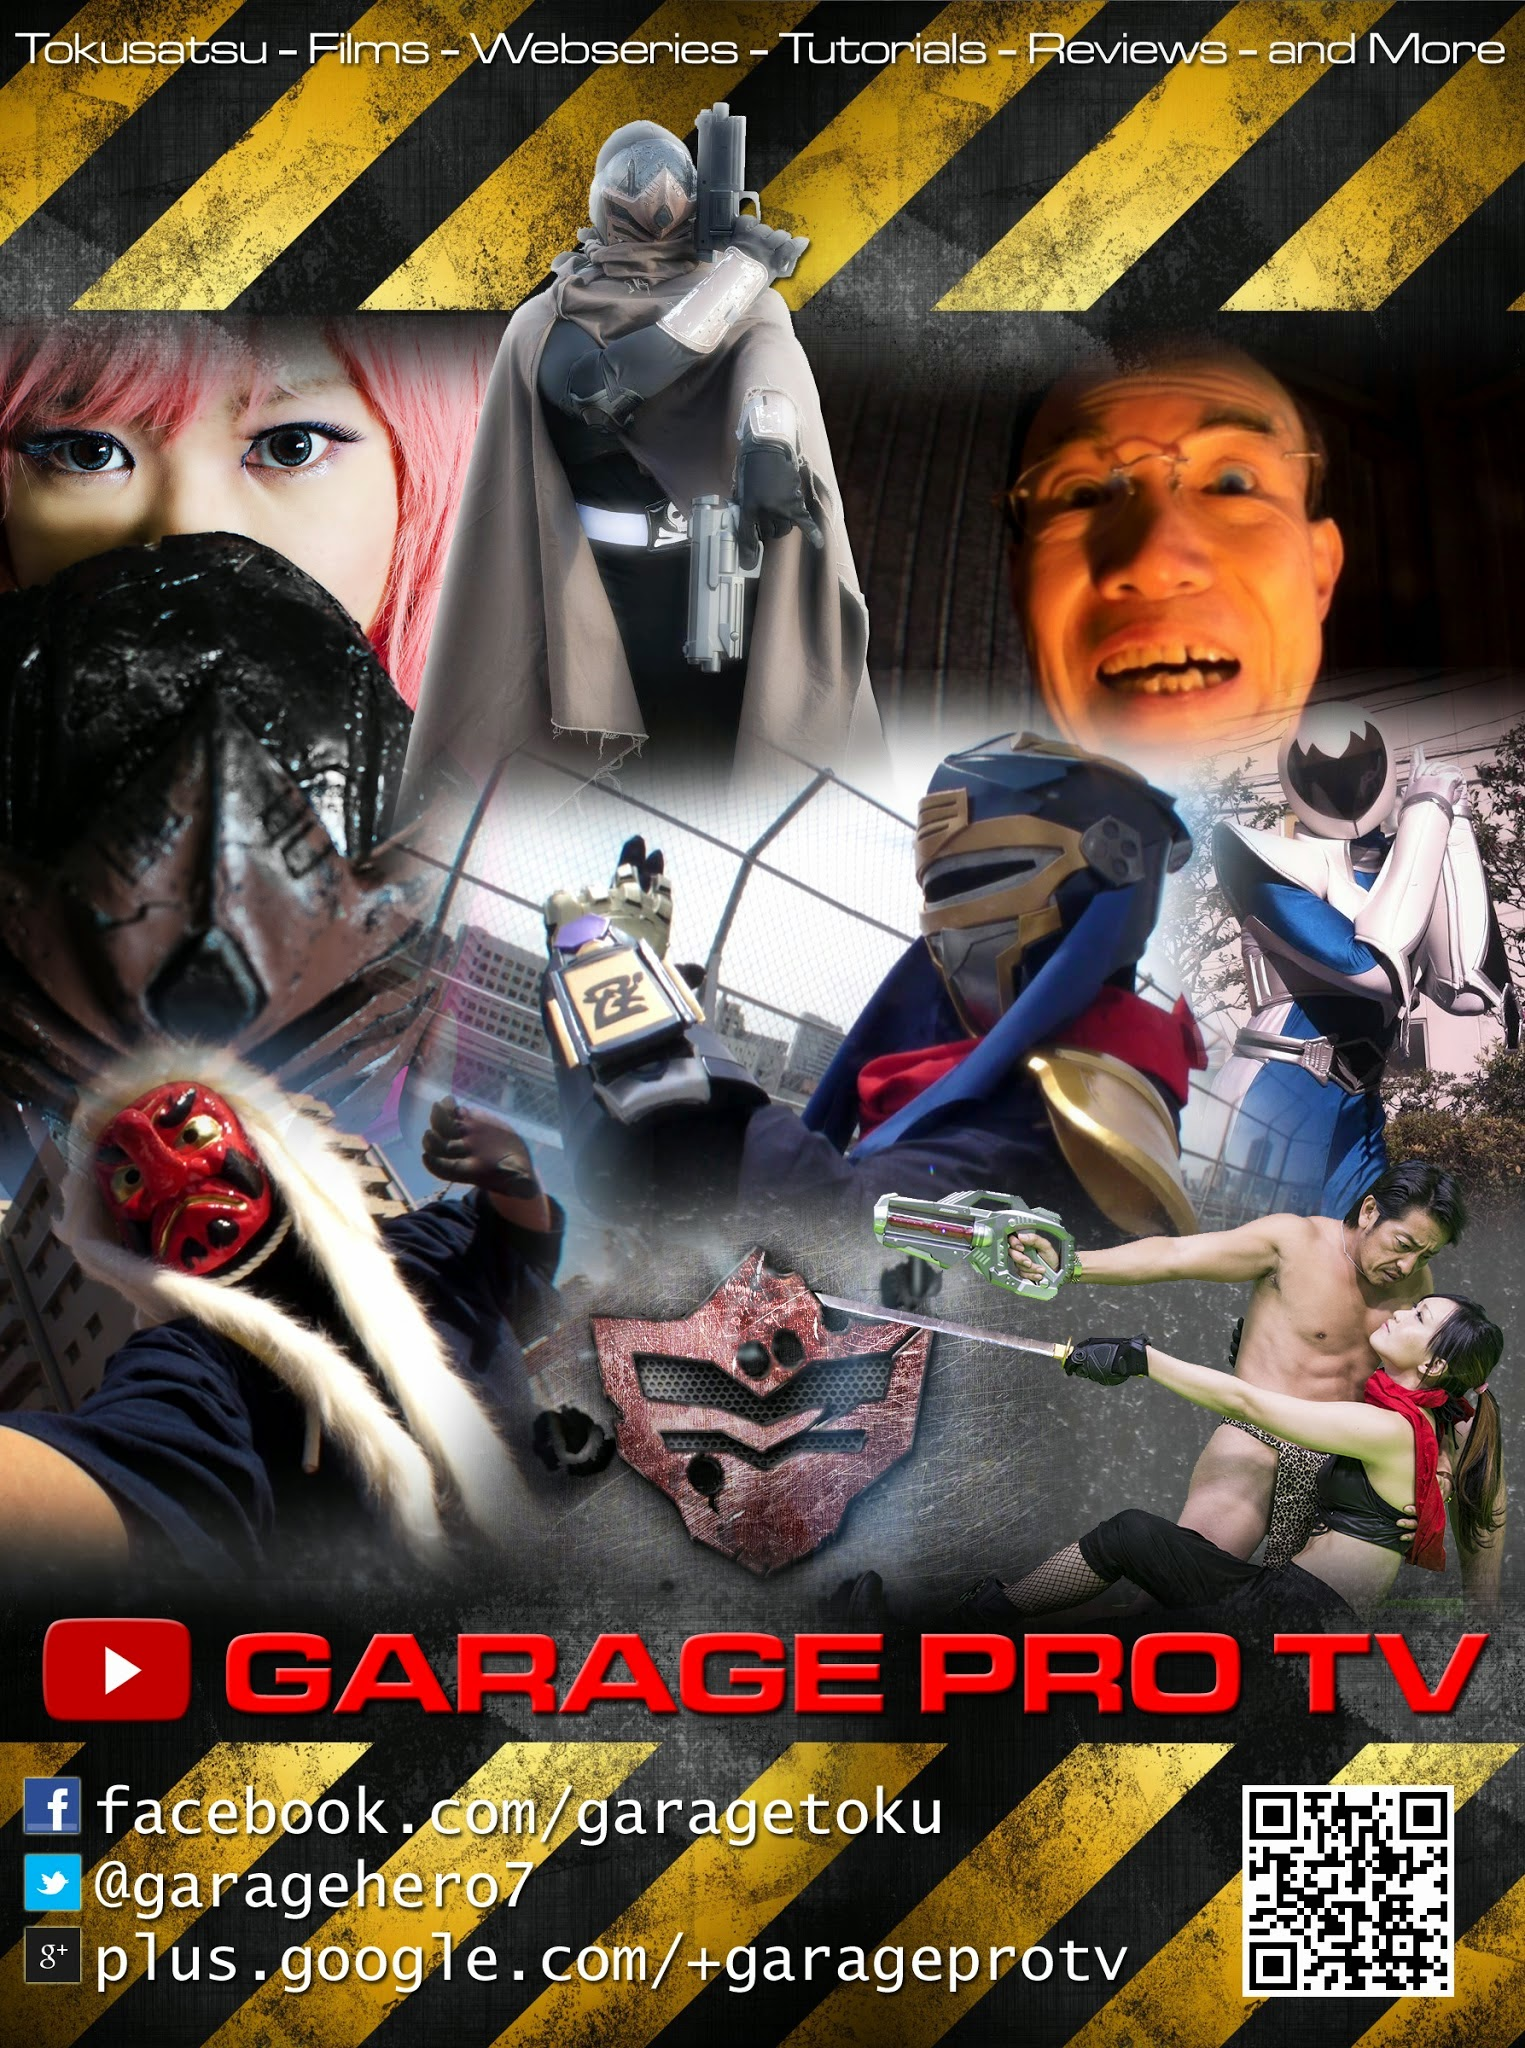 GarageProTVFlier